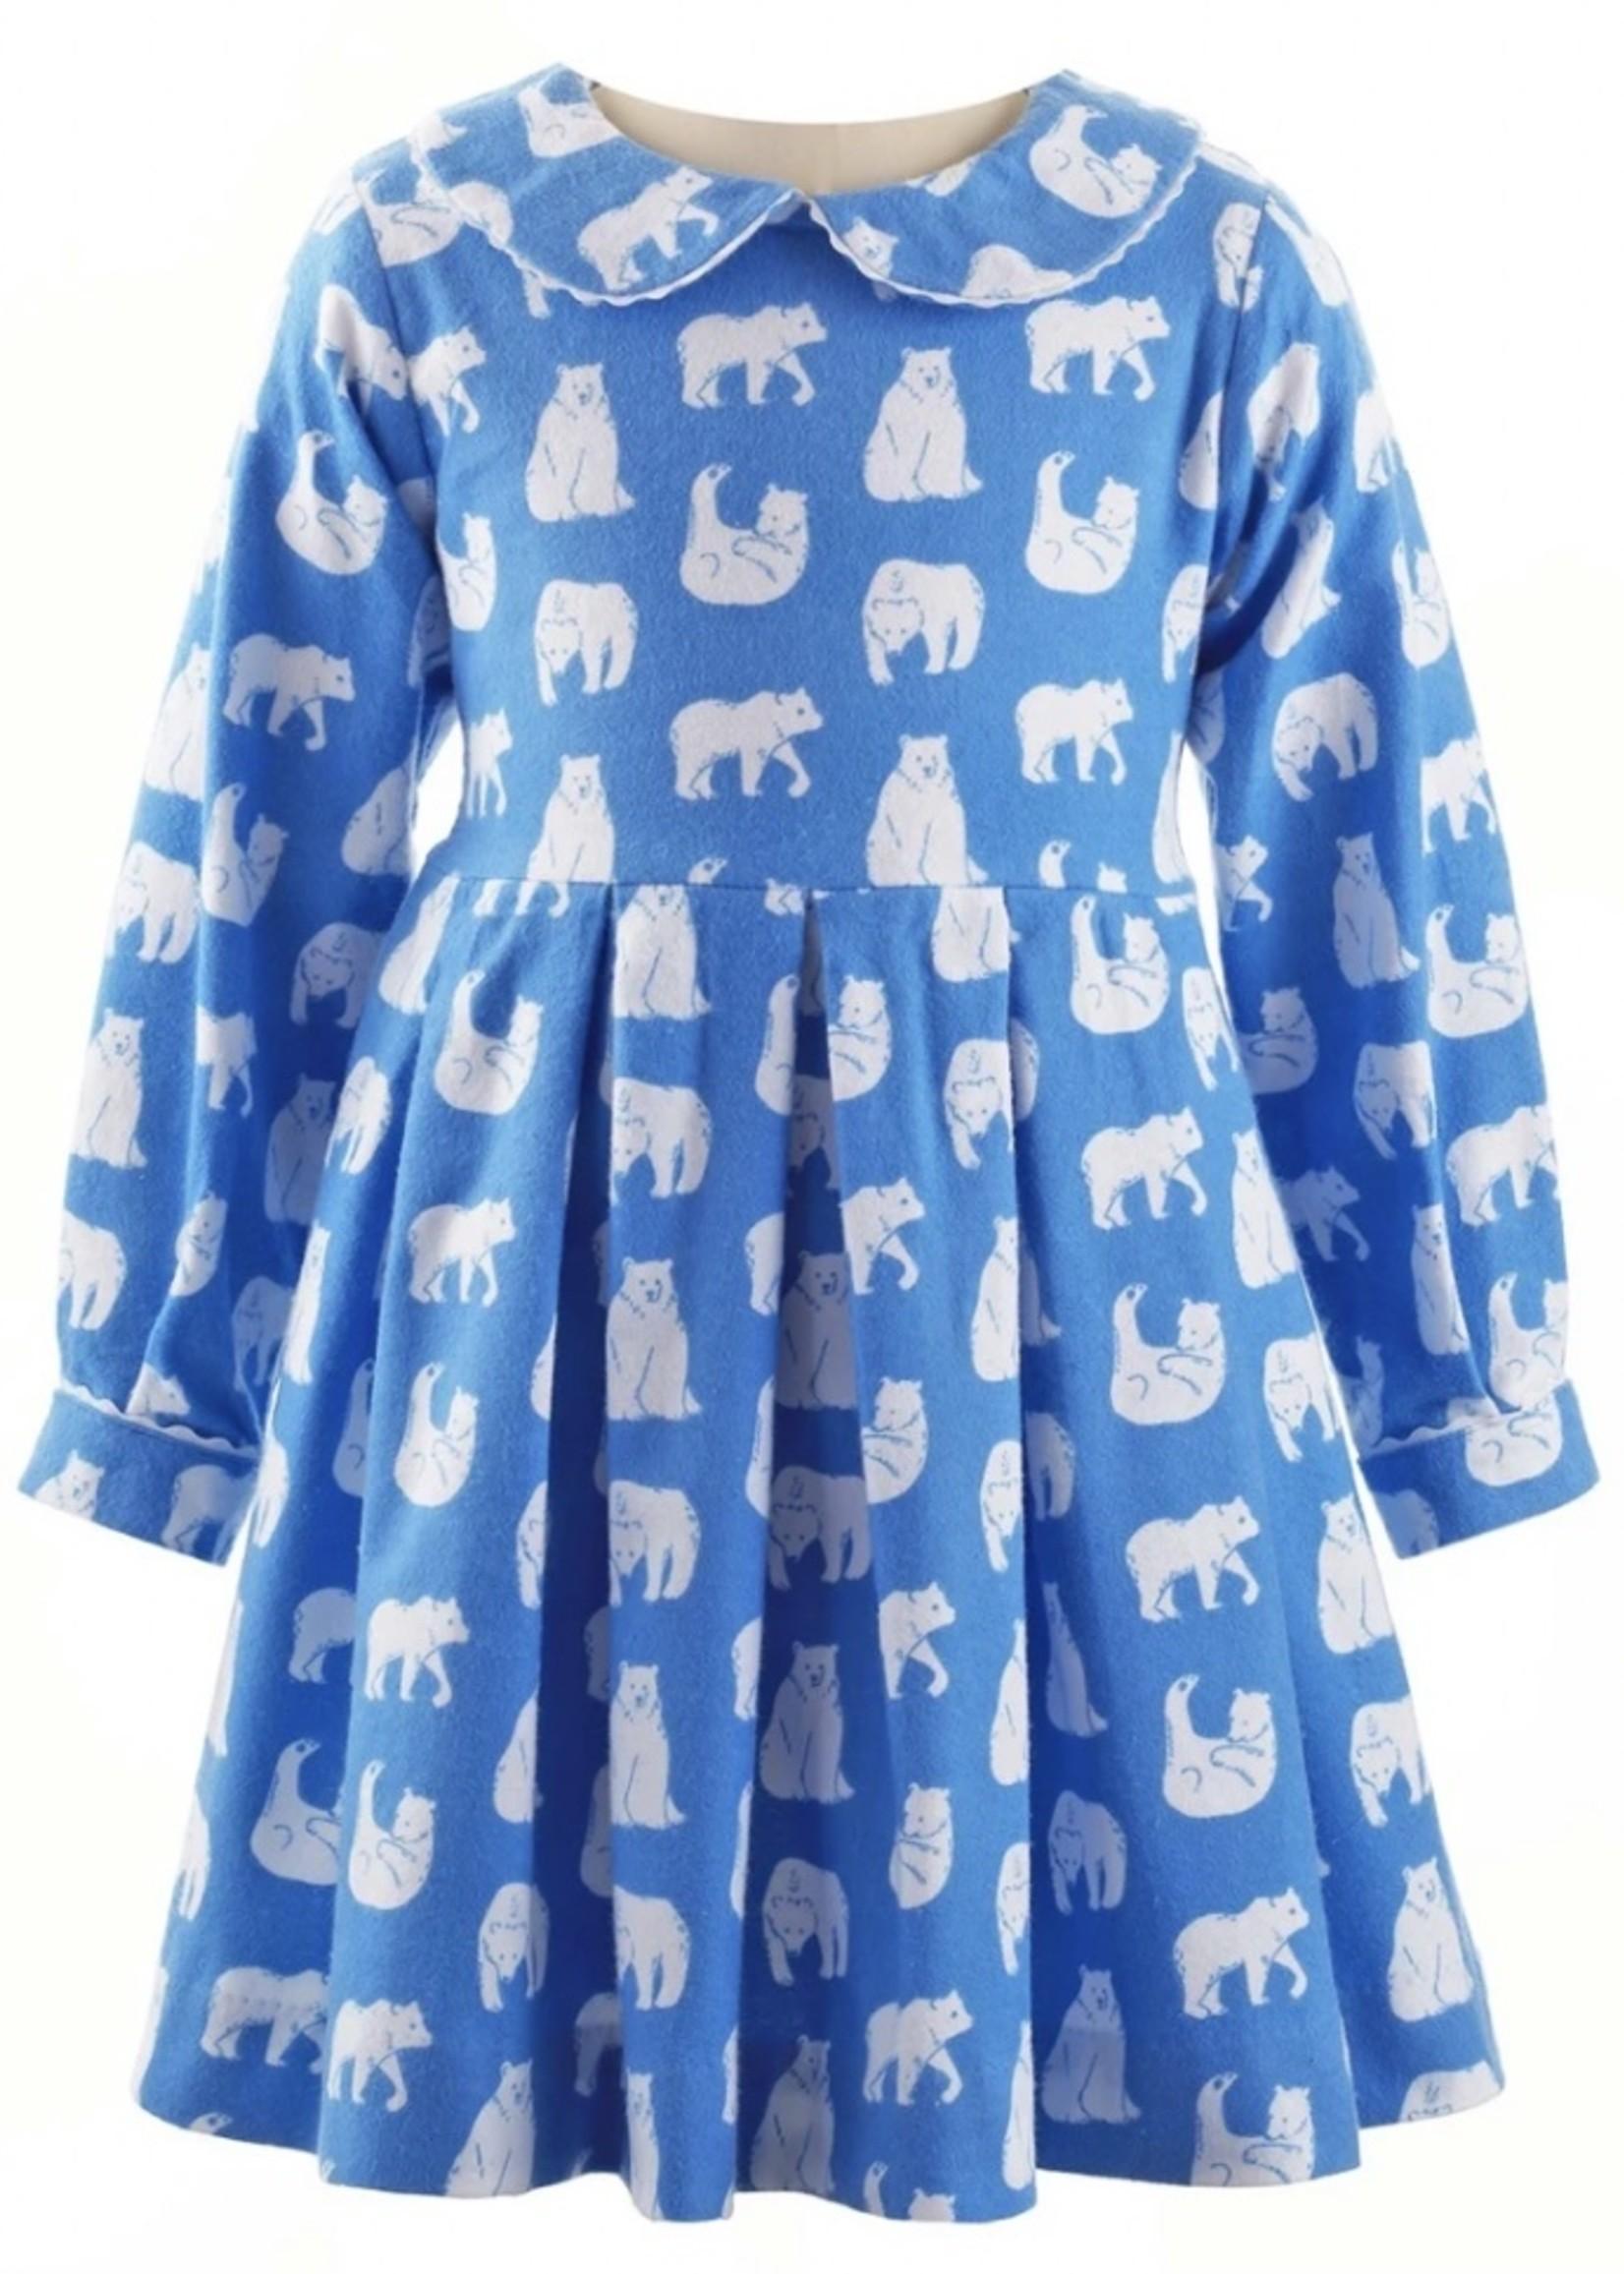 Polar Bear Flannel Dress Blue